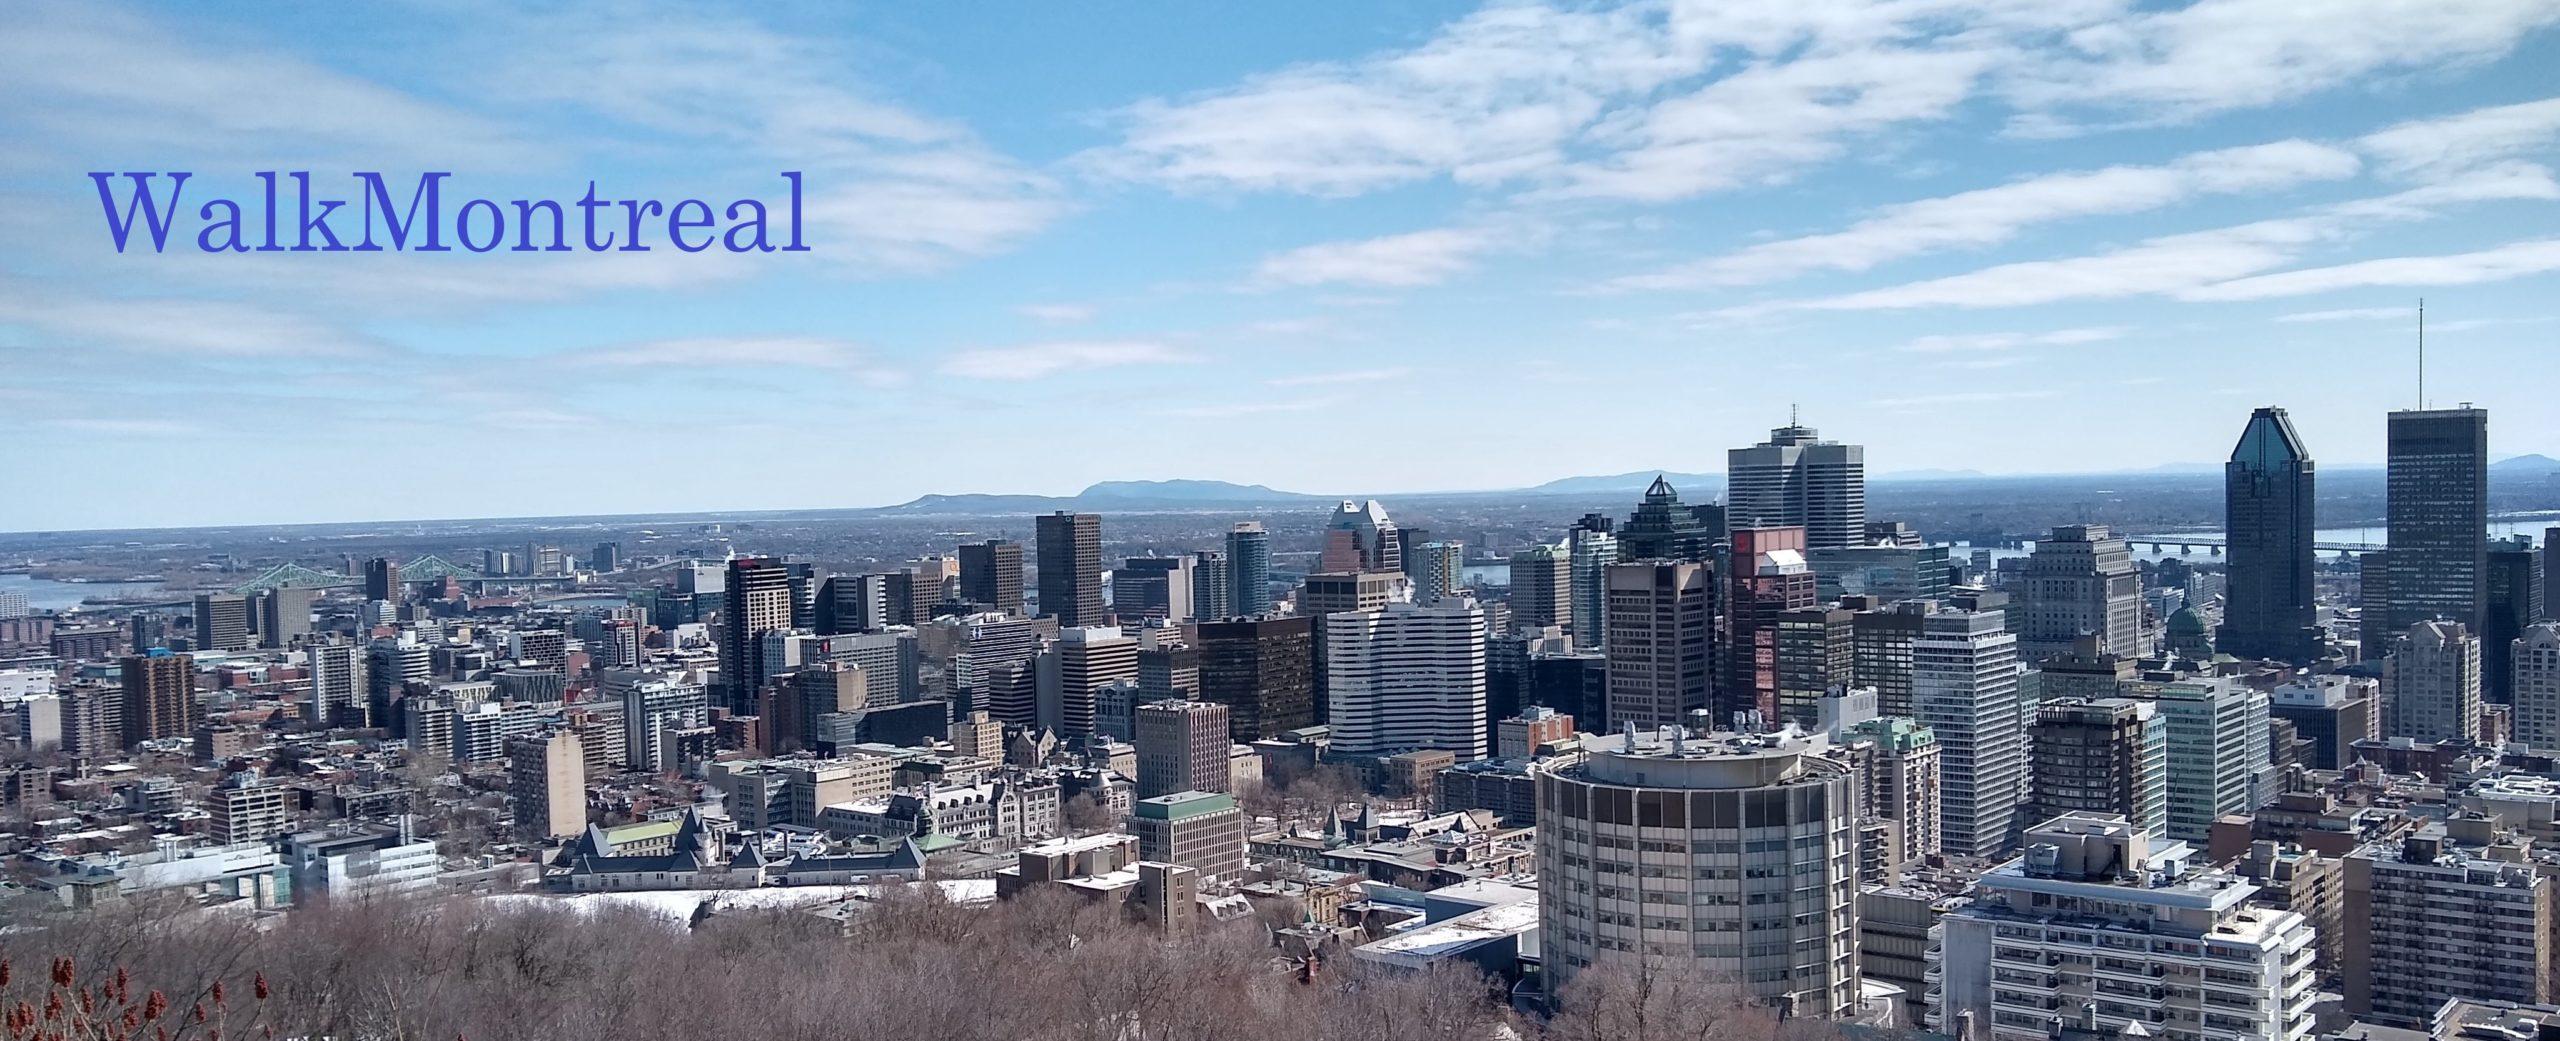 Walk Montreal